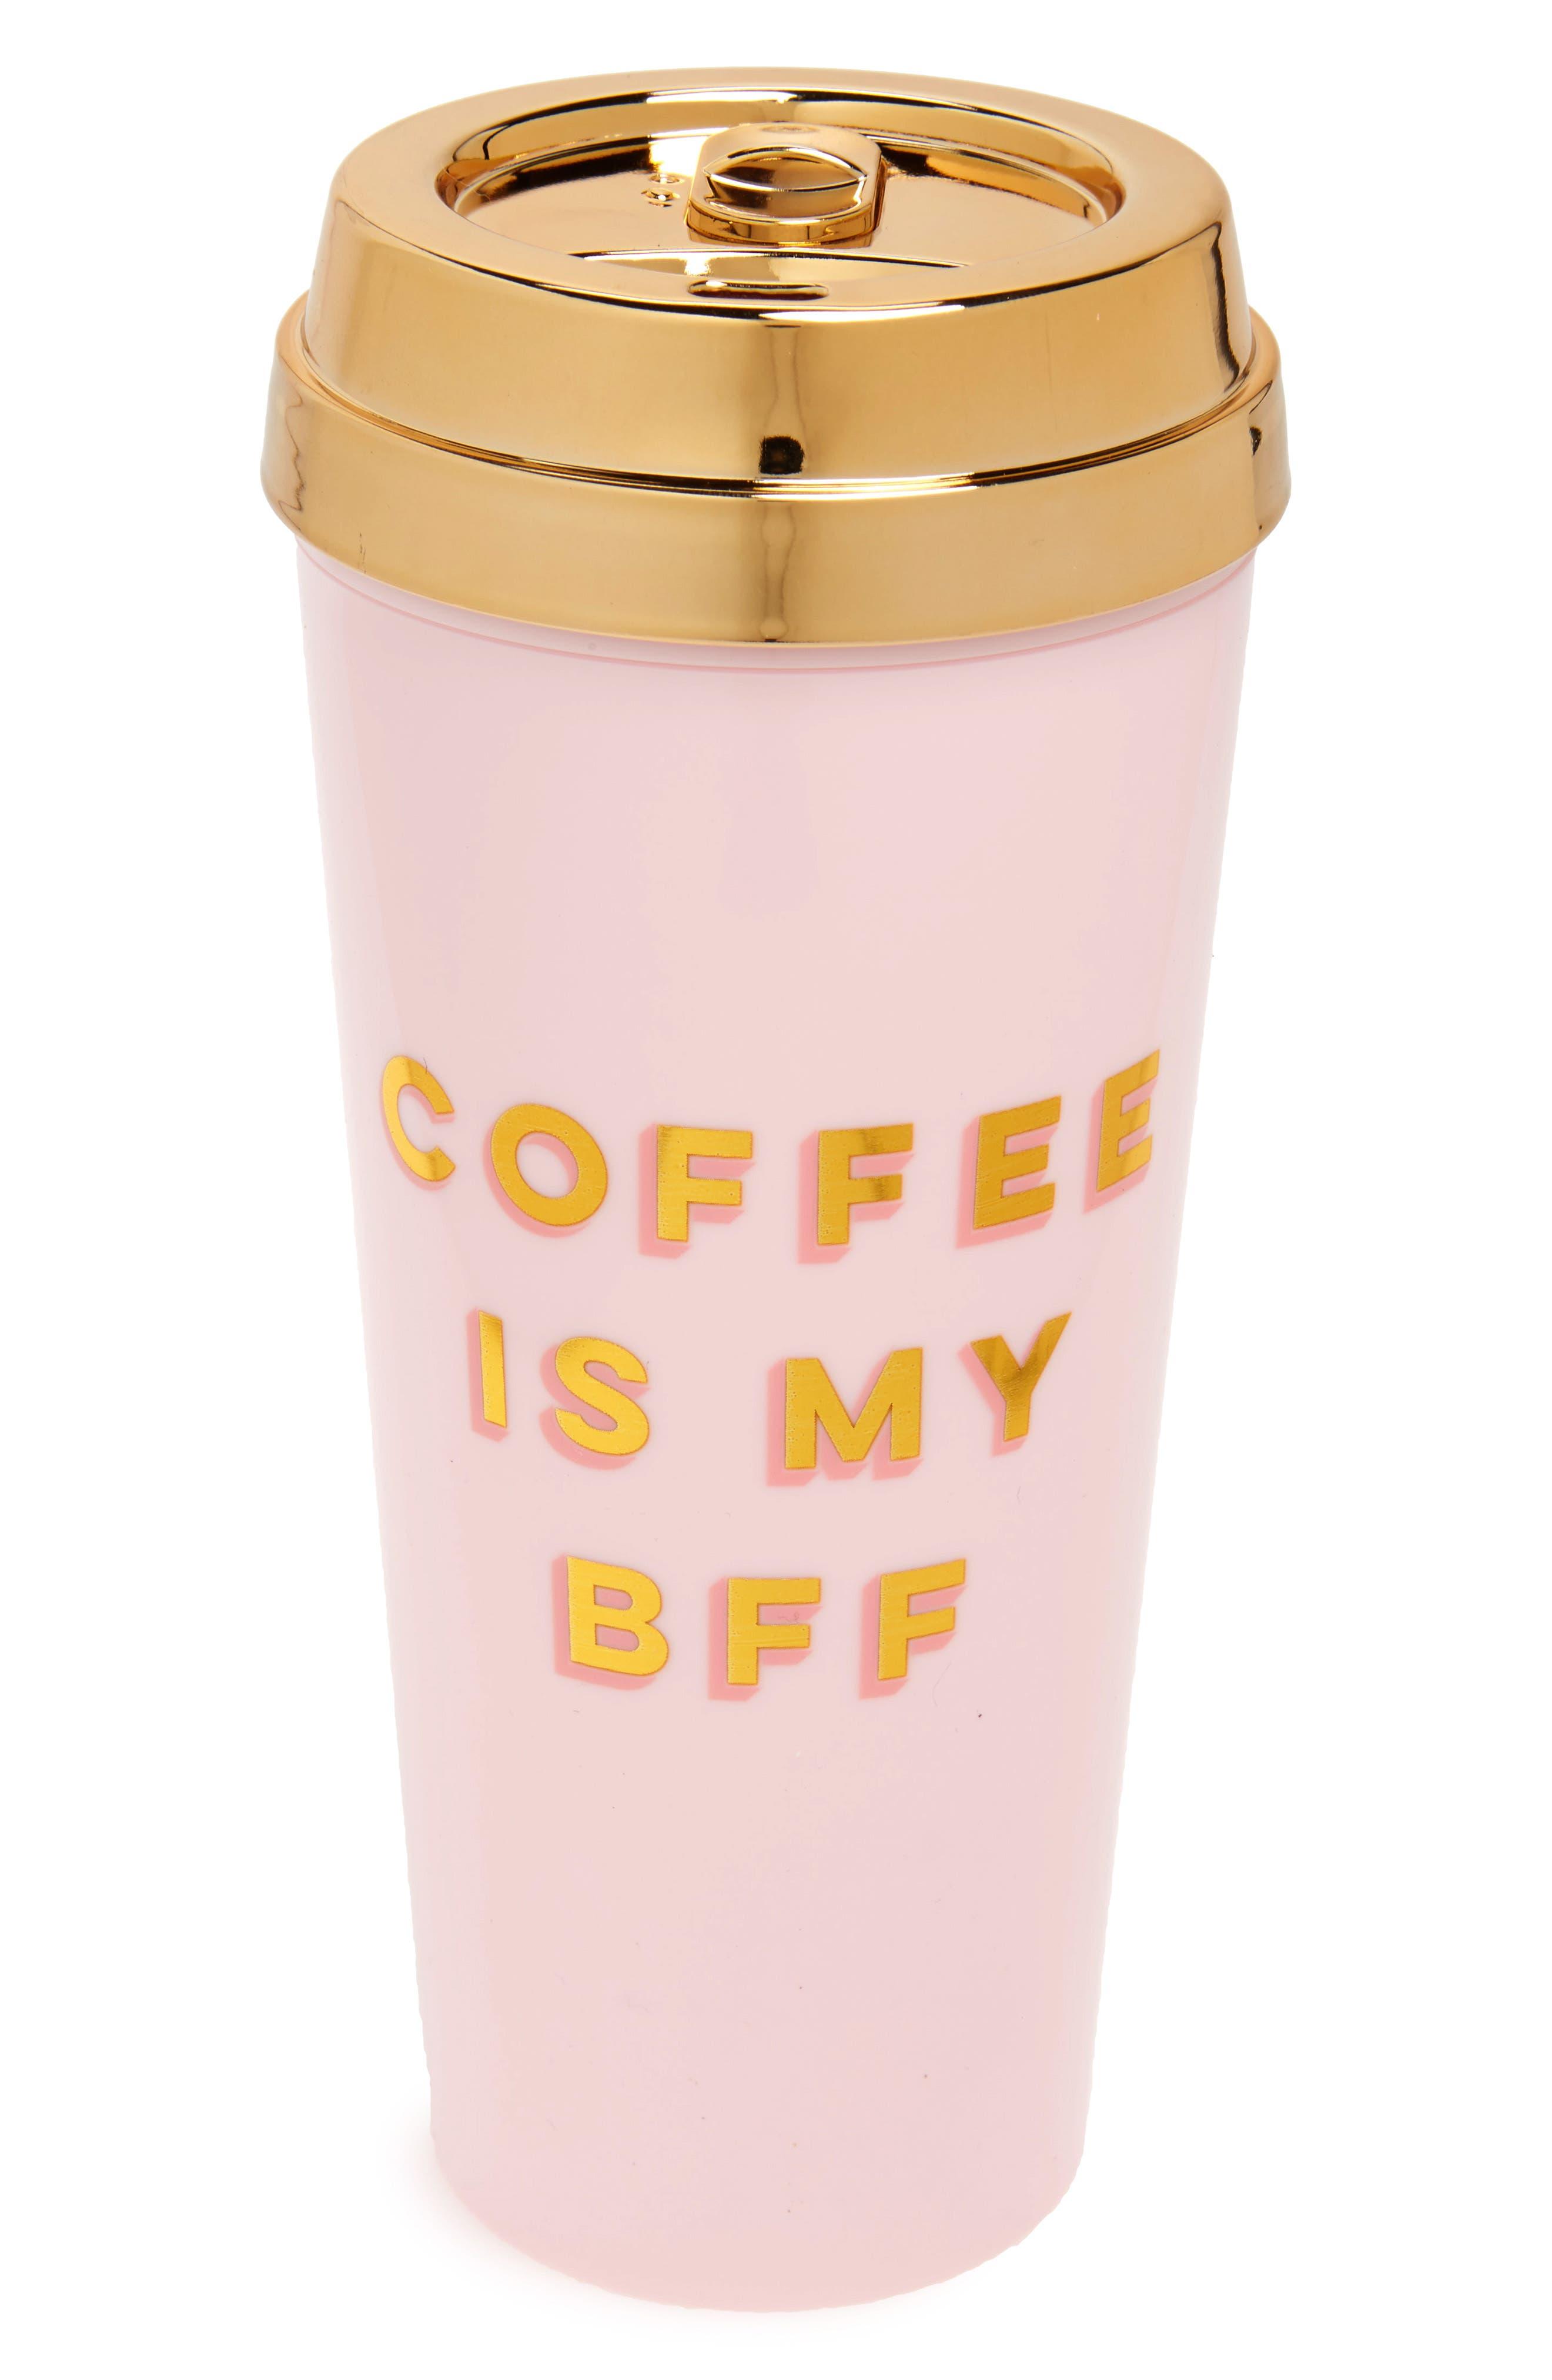 ban.do BFF Deluxe Thermal Travel Mug